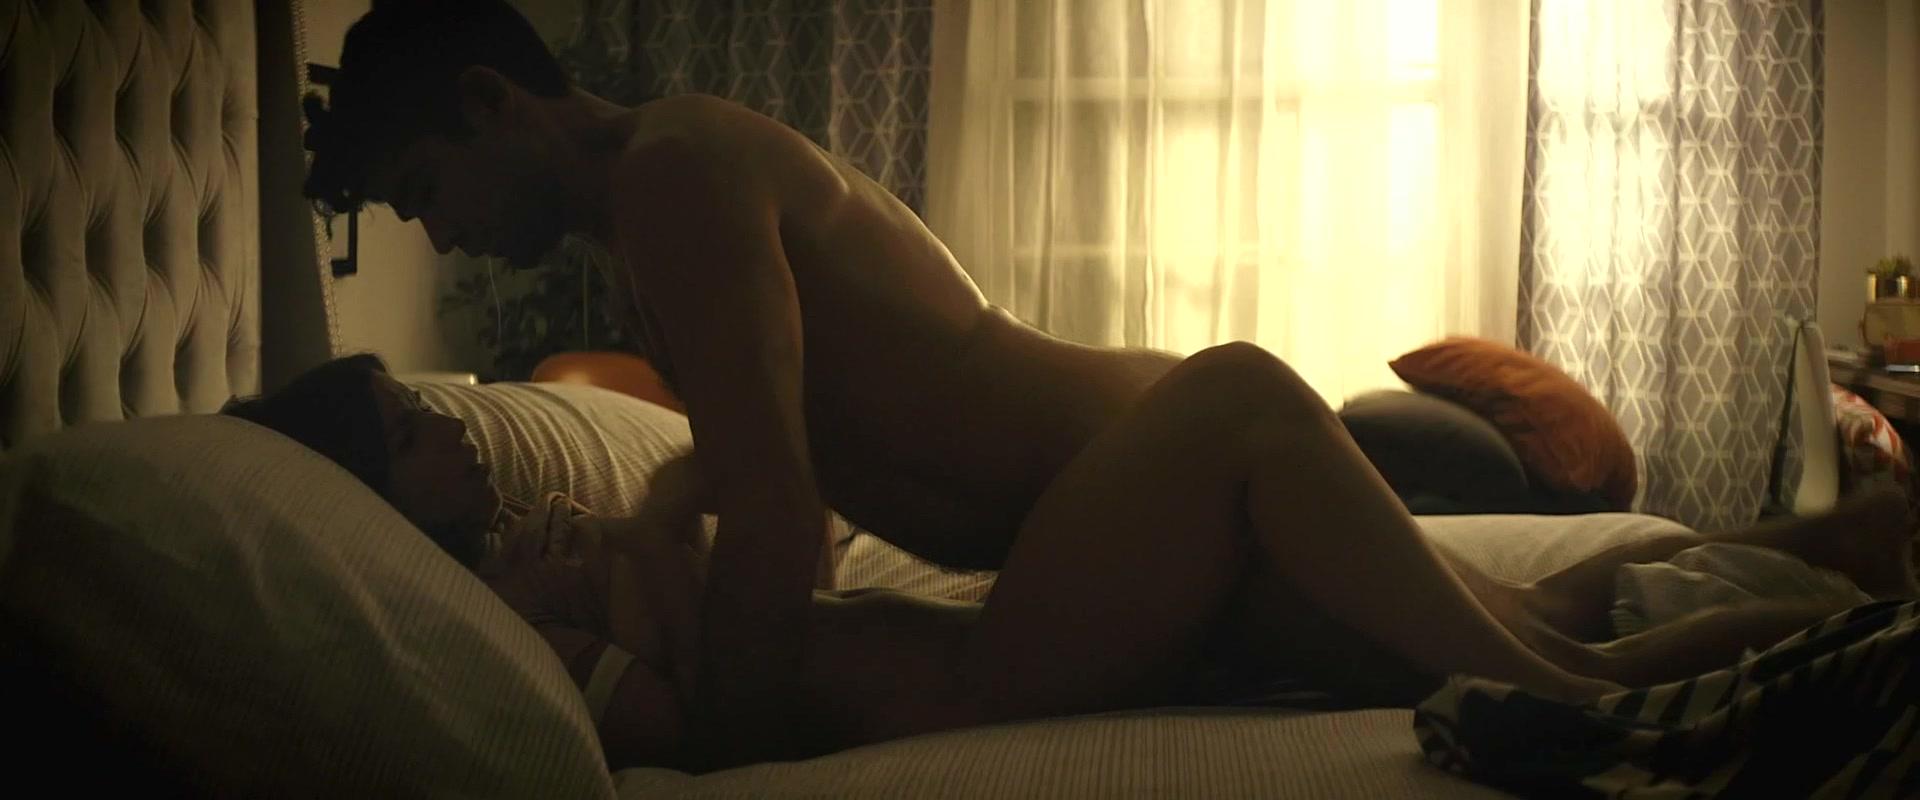 CelebGate Angela Trimbur Nude  Trash Fire - 2016 HD